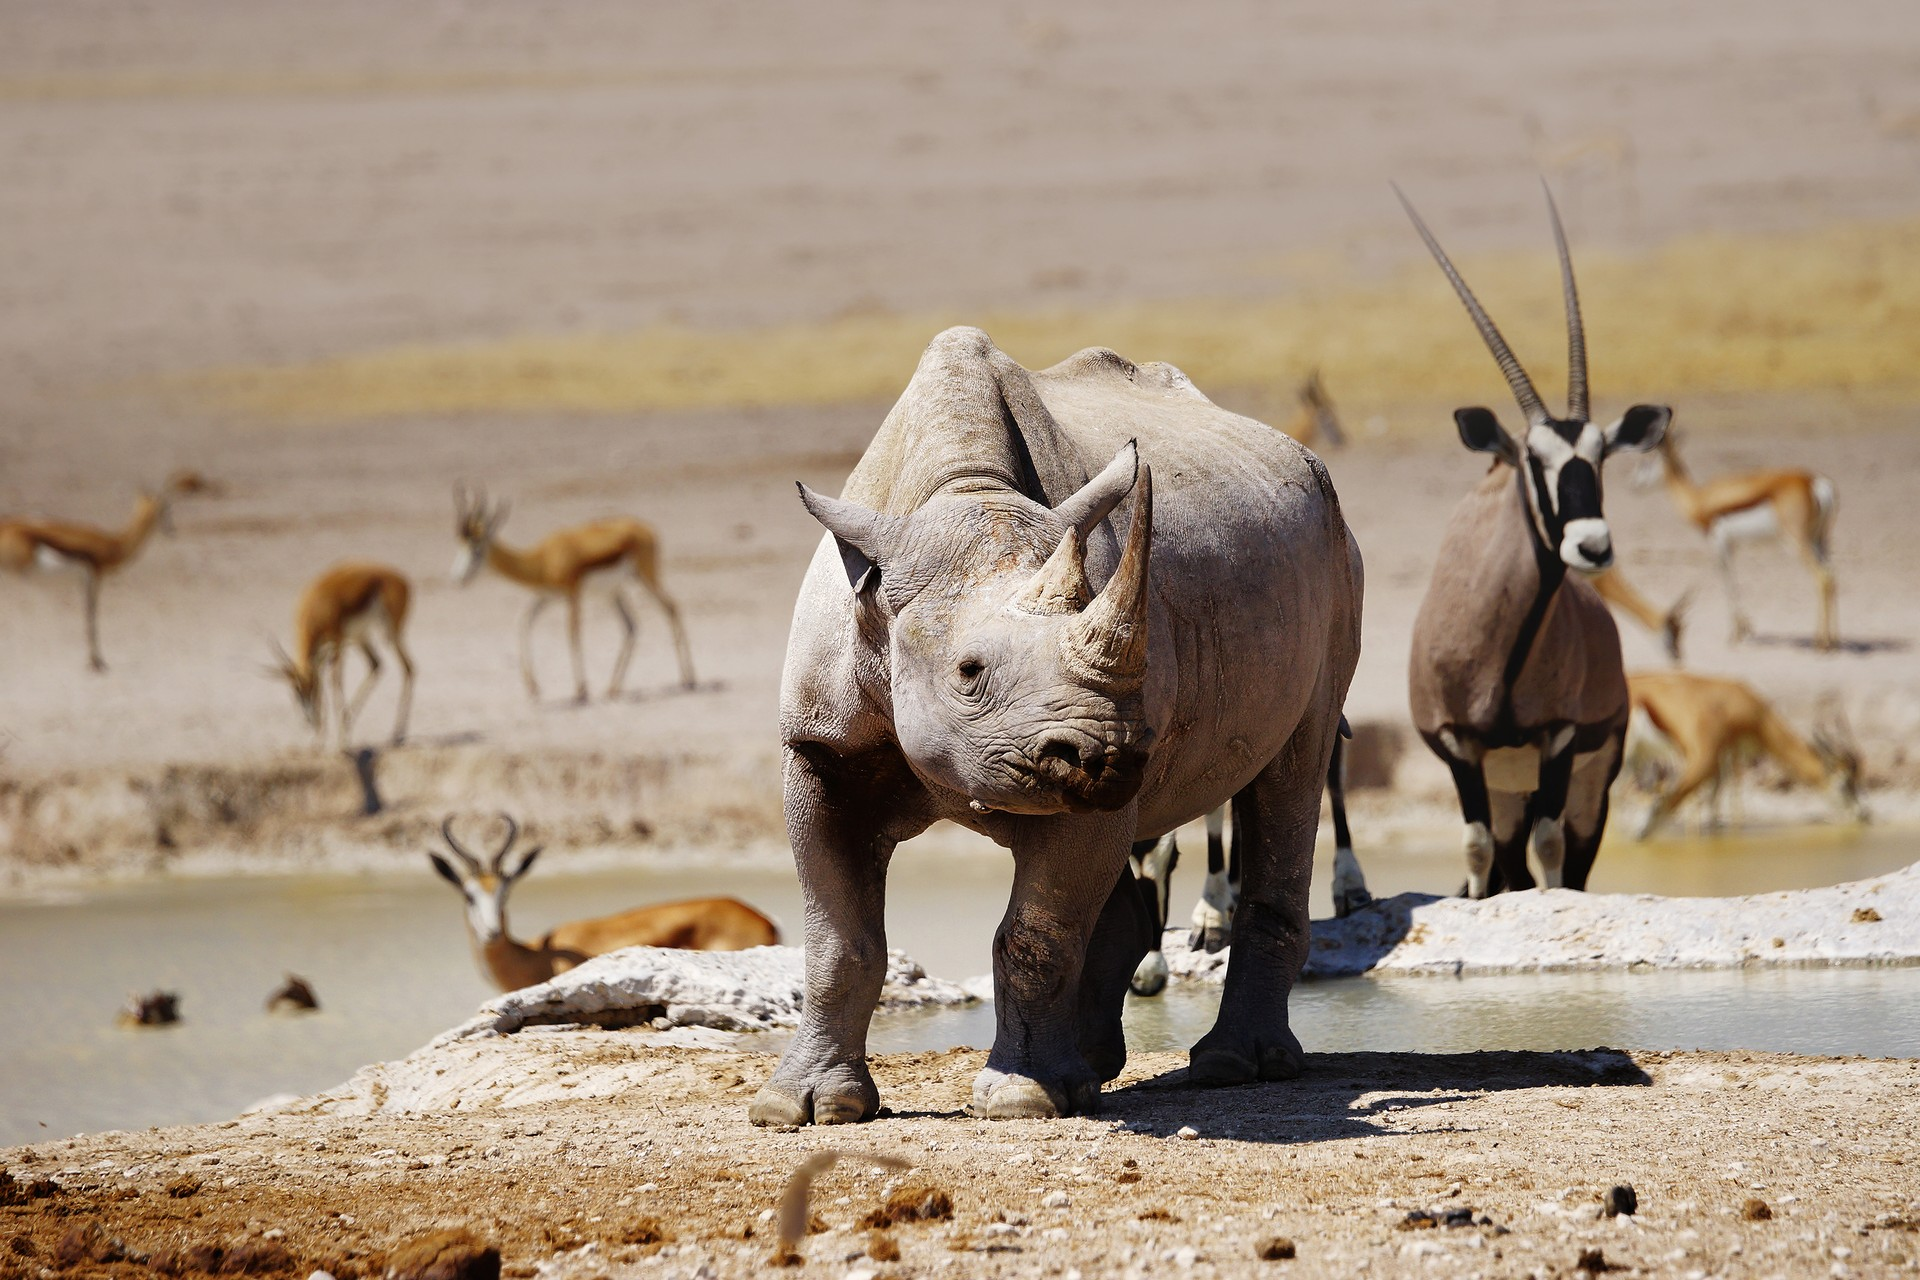 Black Rhino at Namibia watering hole